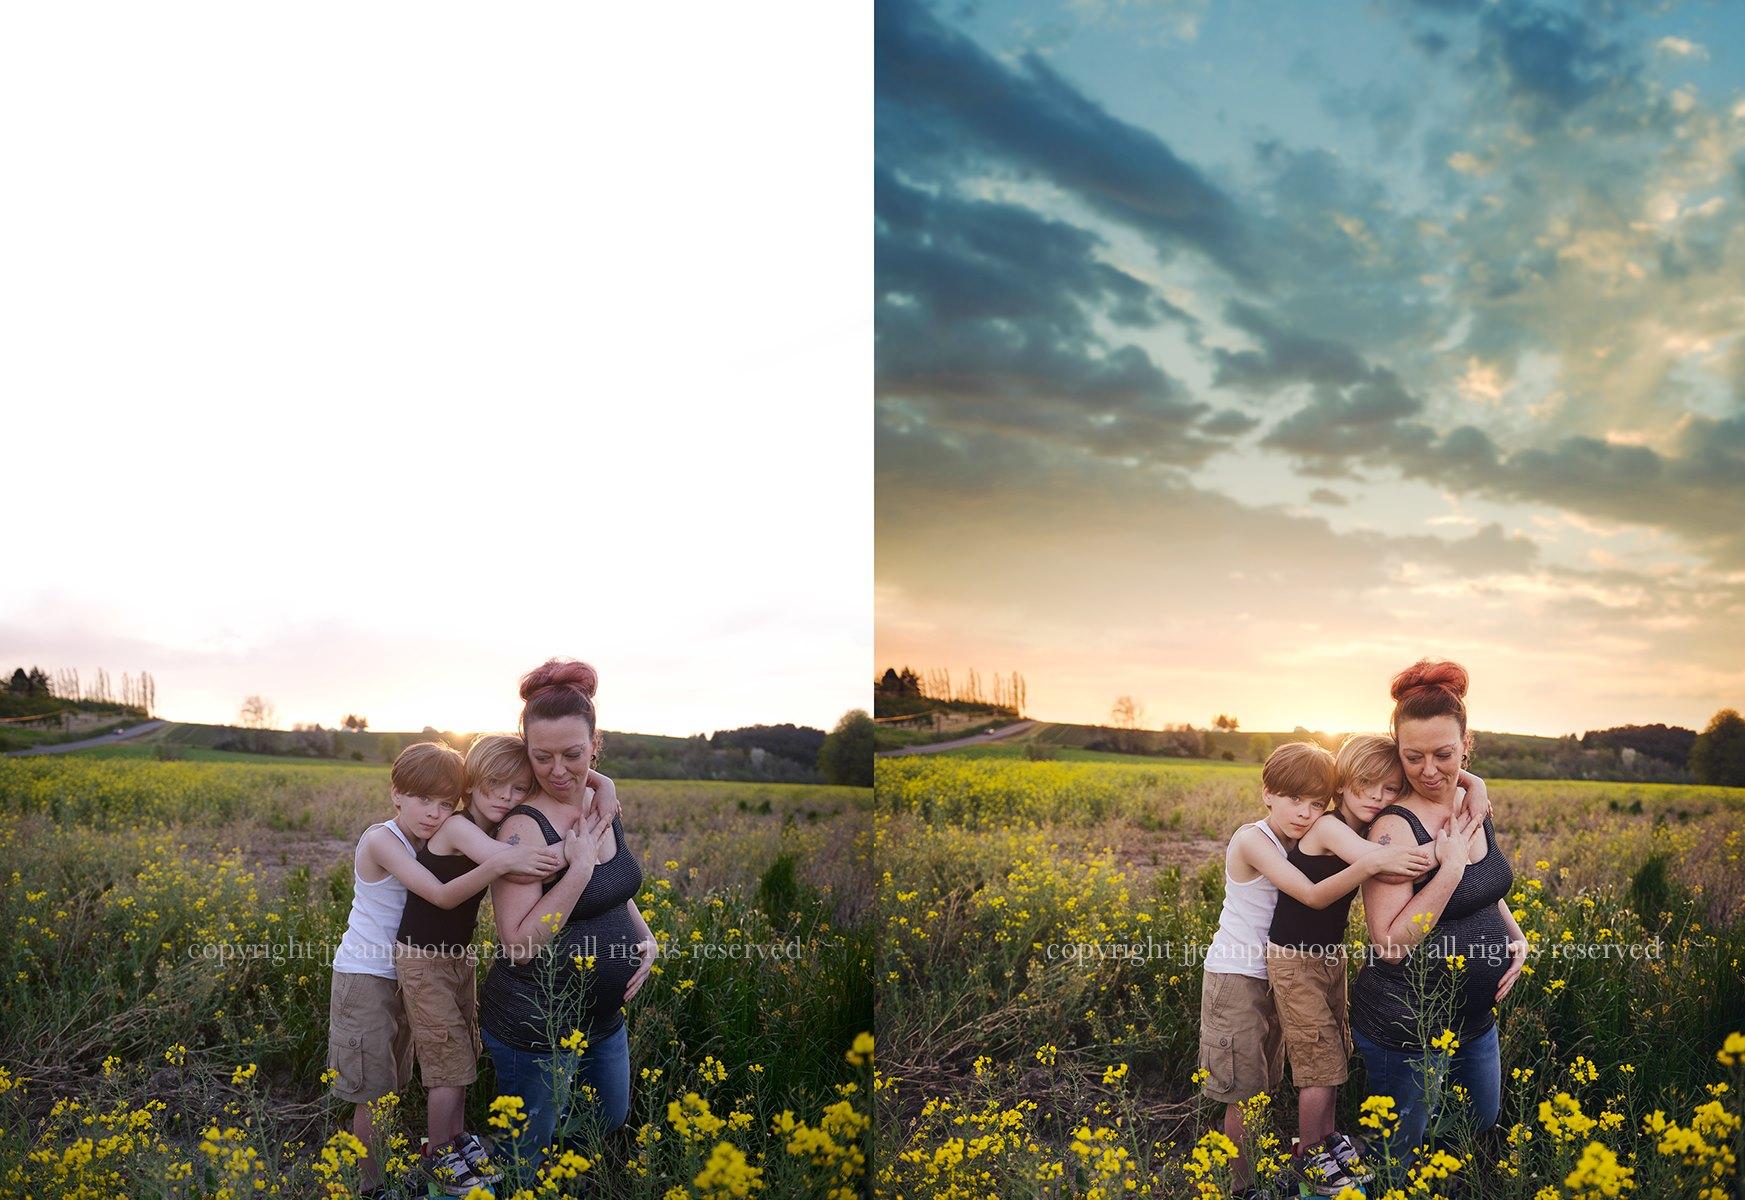 Add a Sky in Photoshop